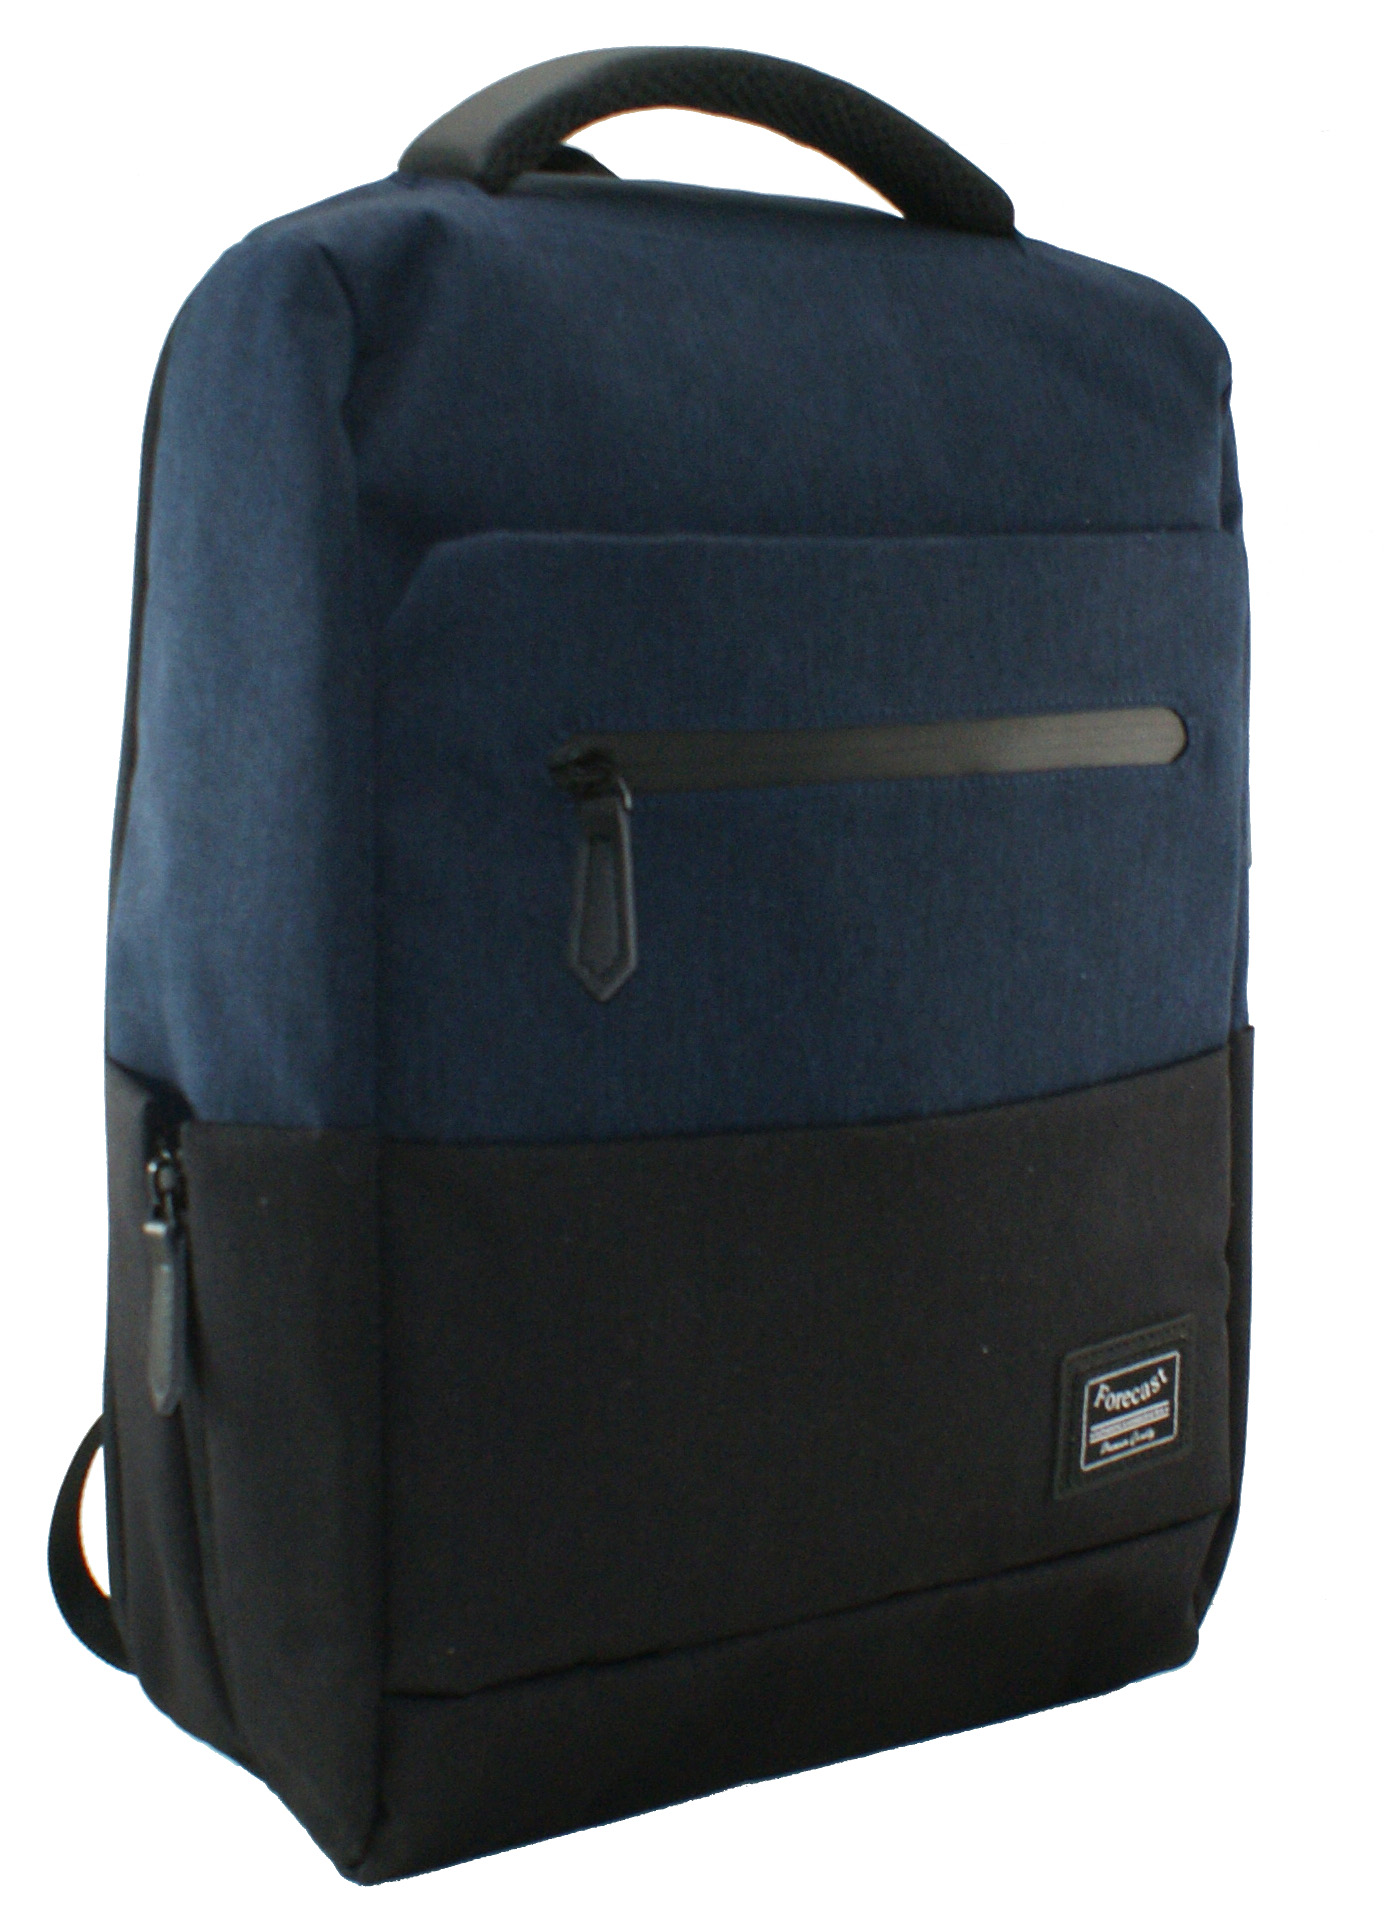 7042abead5 Antitheft Σακίδιο πλάτης Forecast A16006 σε μπλε χρώμα για laptop 15.6    έως 6 άτοκες